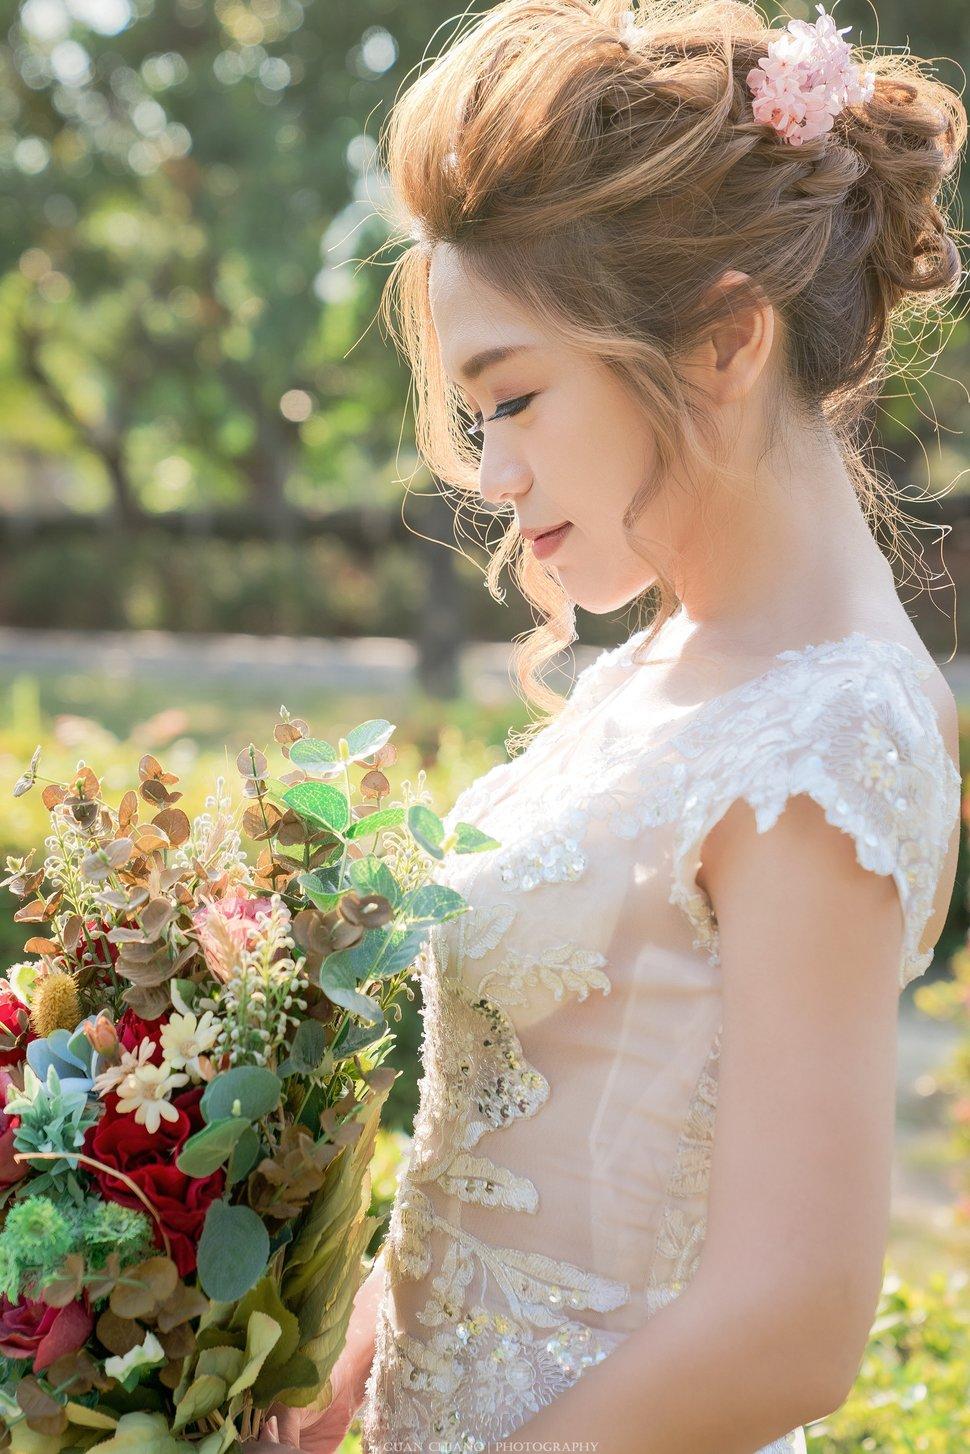 dsc01392-1_26074004957_o - 全台最便宜-45DESIGN四五婚紗禮服《結婚吧》